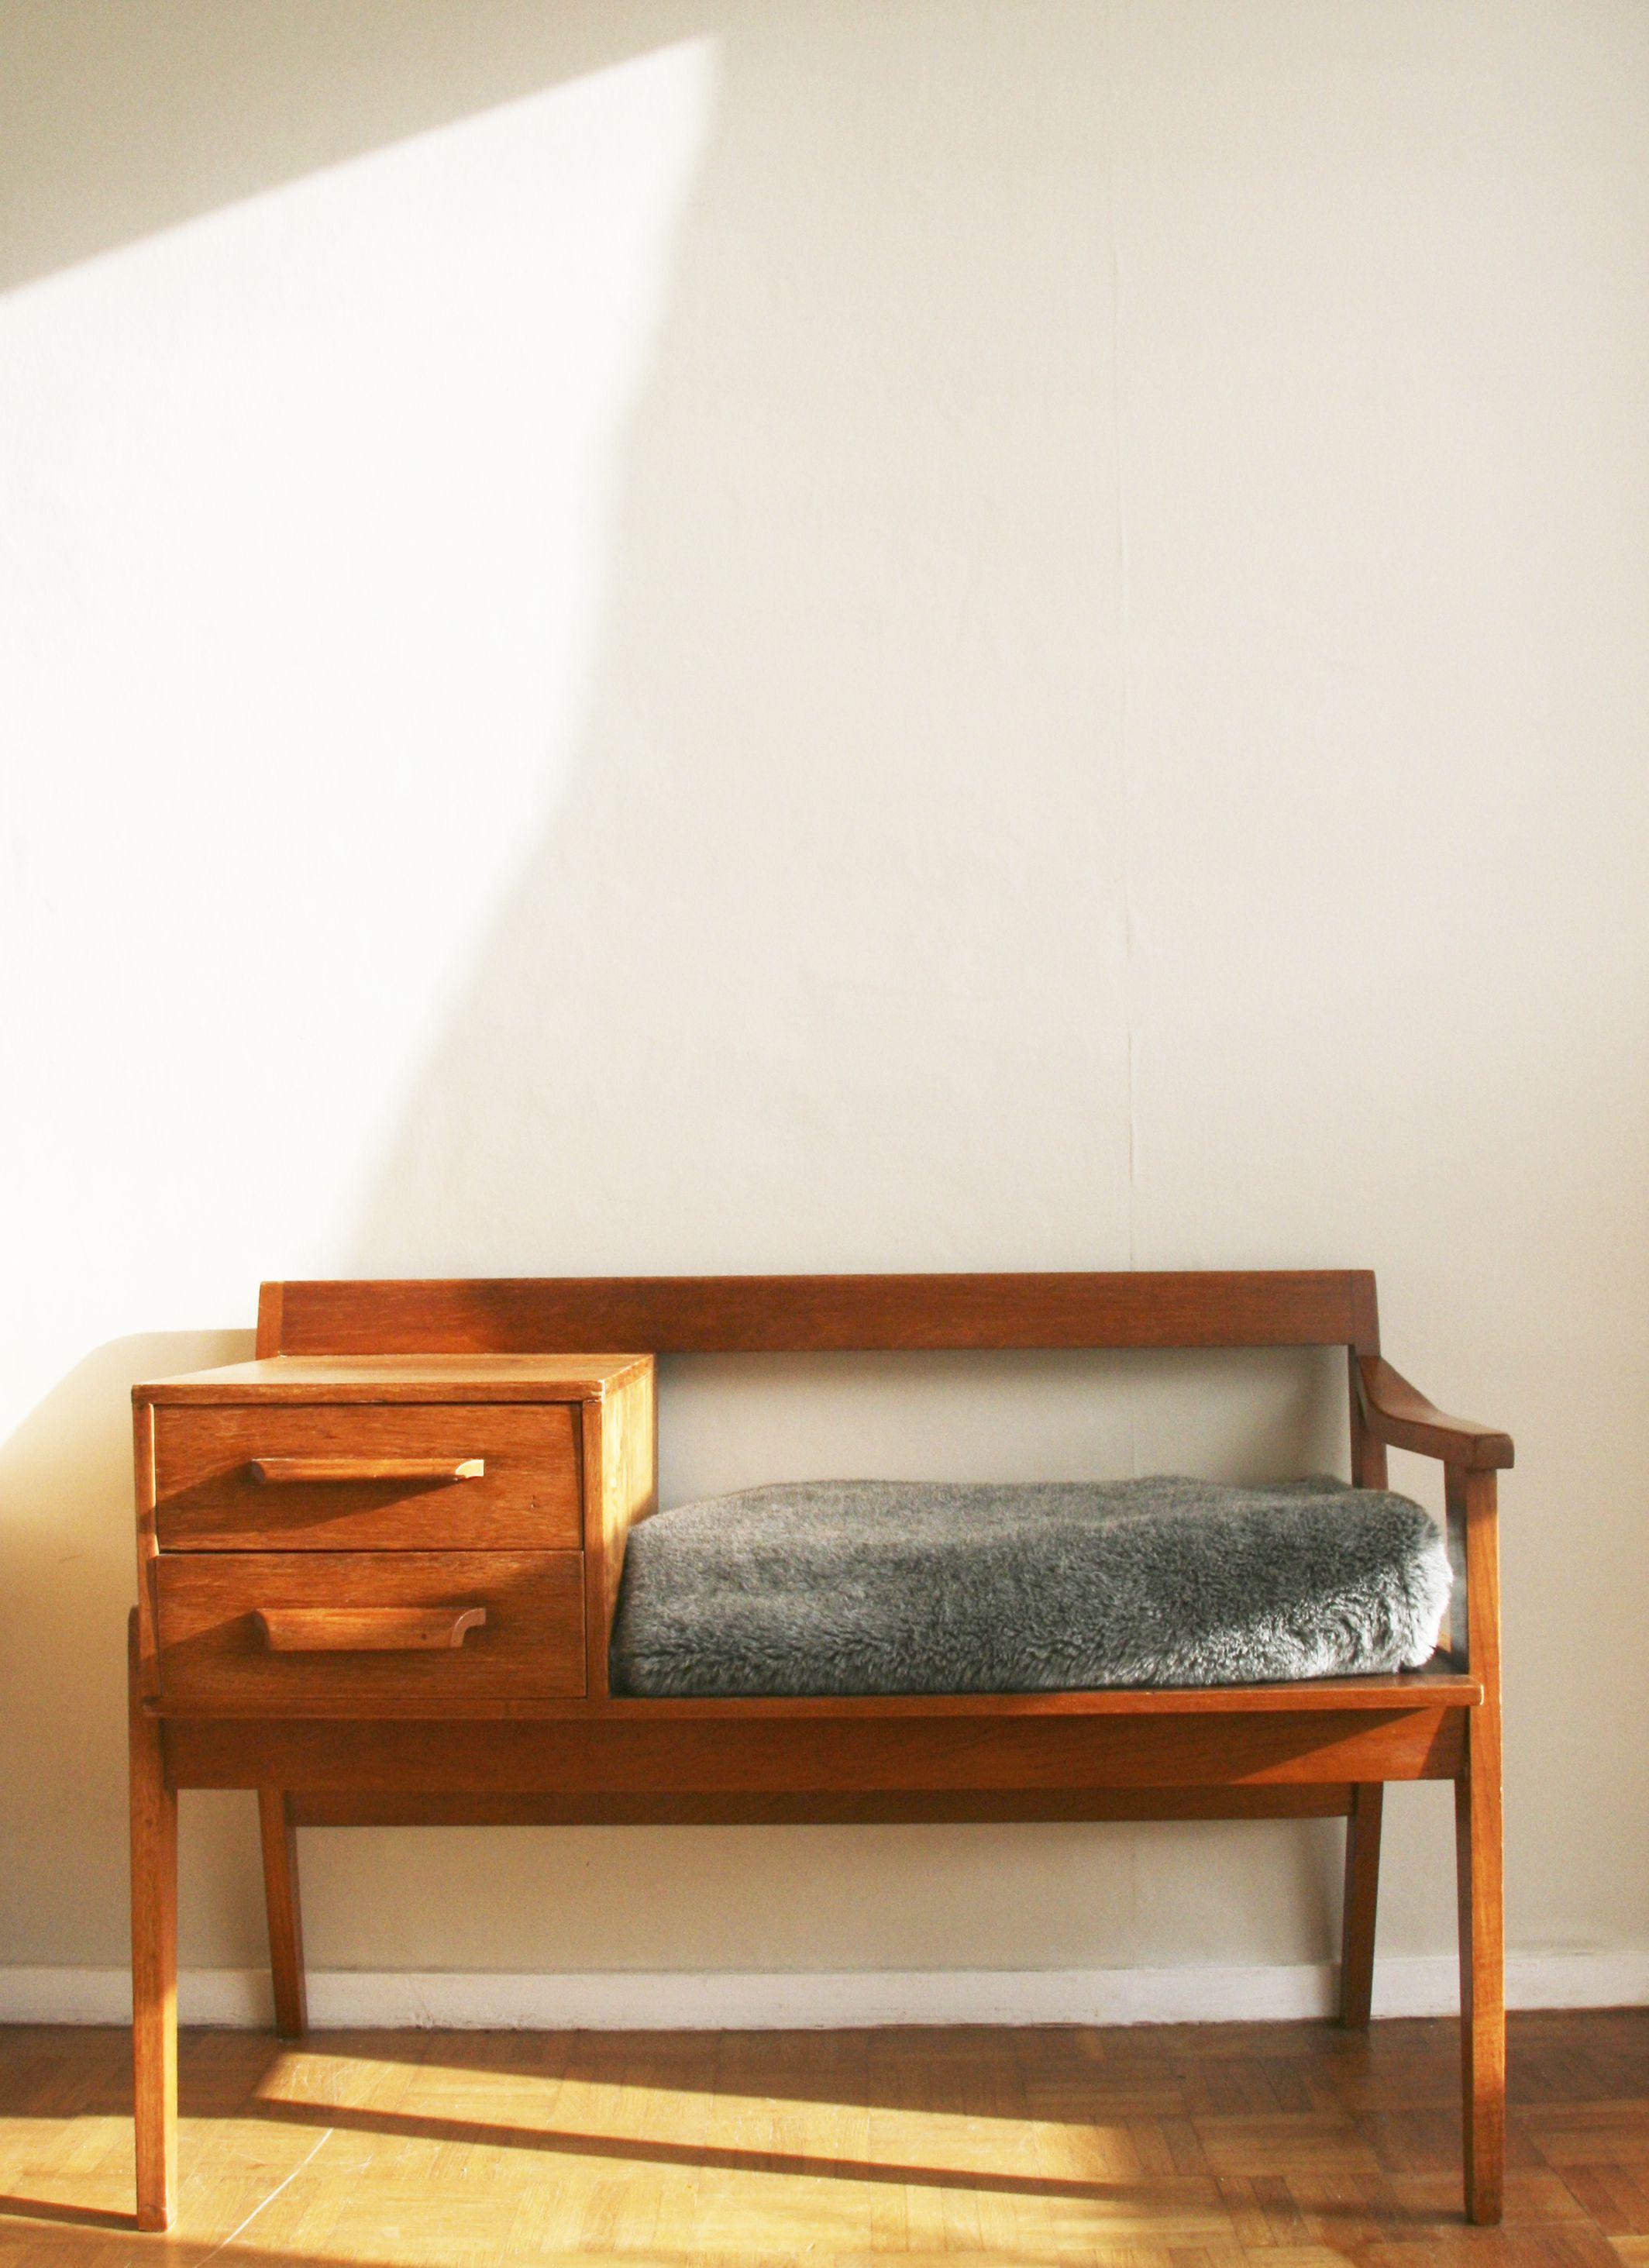 sixties furniture design eames sixties furniture tech shoe storage scandinavian style vintage furniture furniture design home sweet in 2018 pinterest